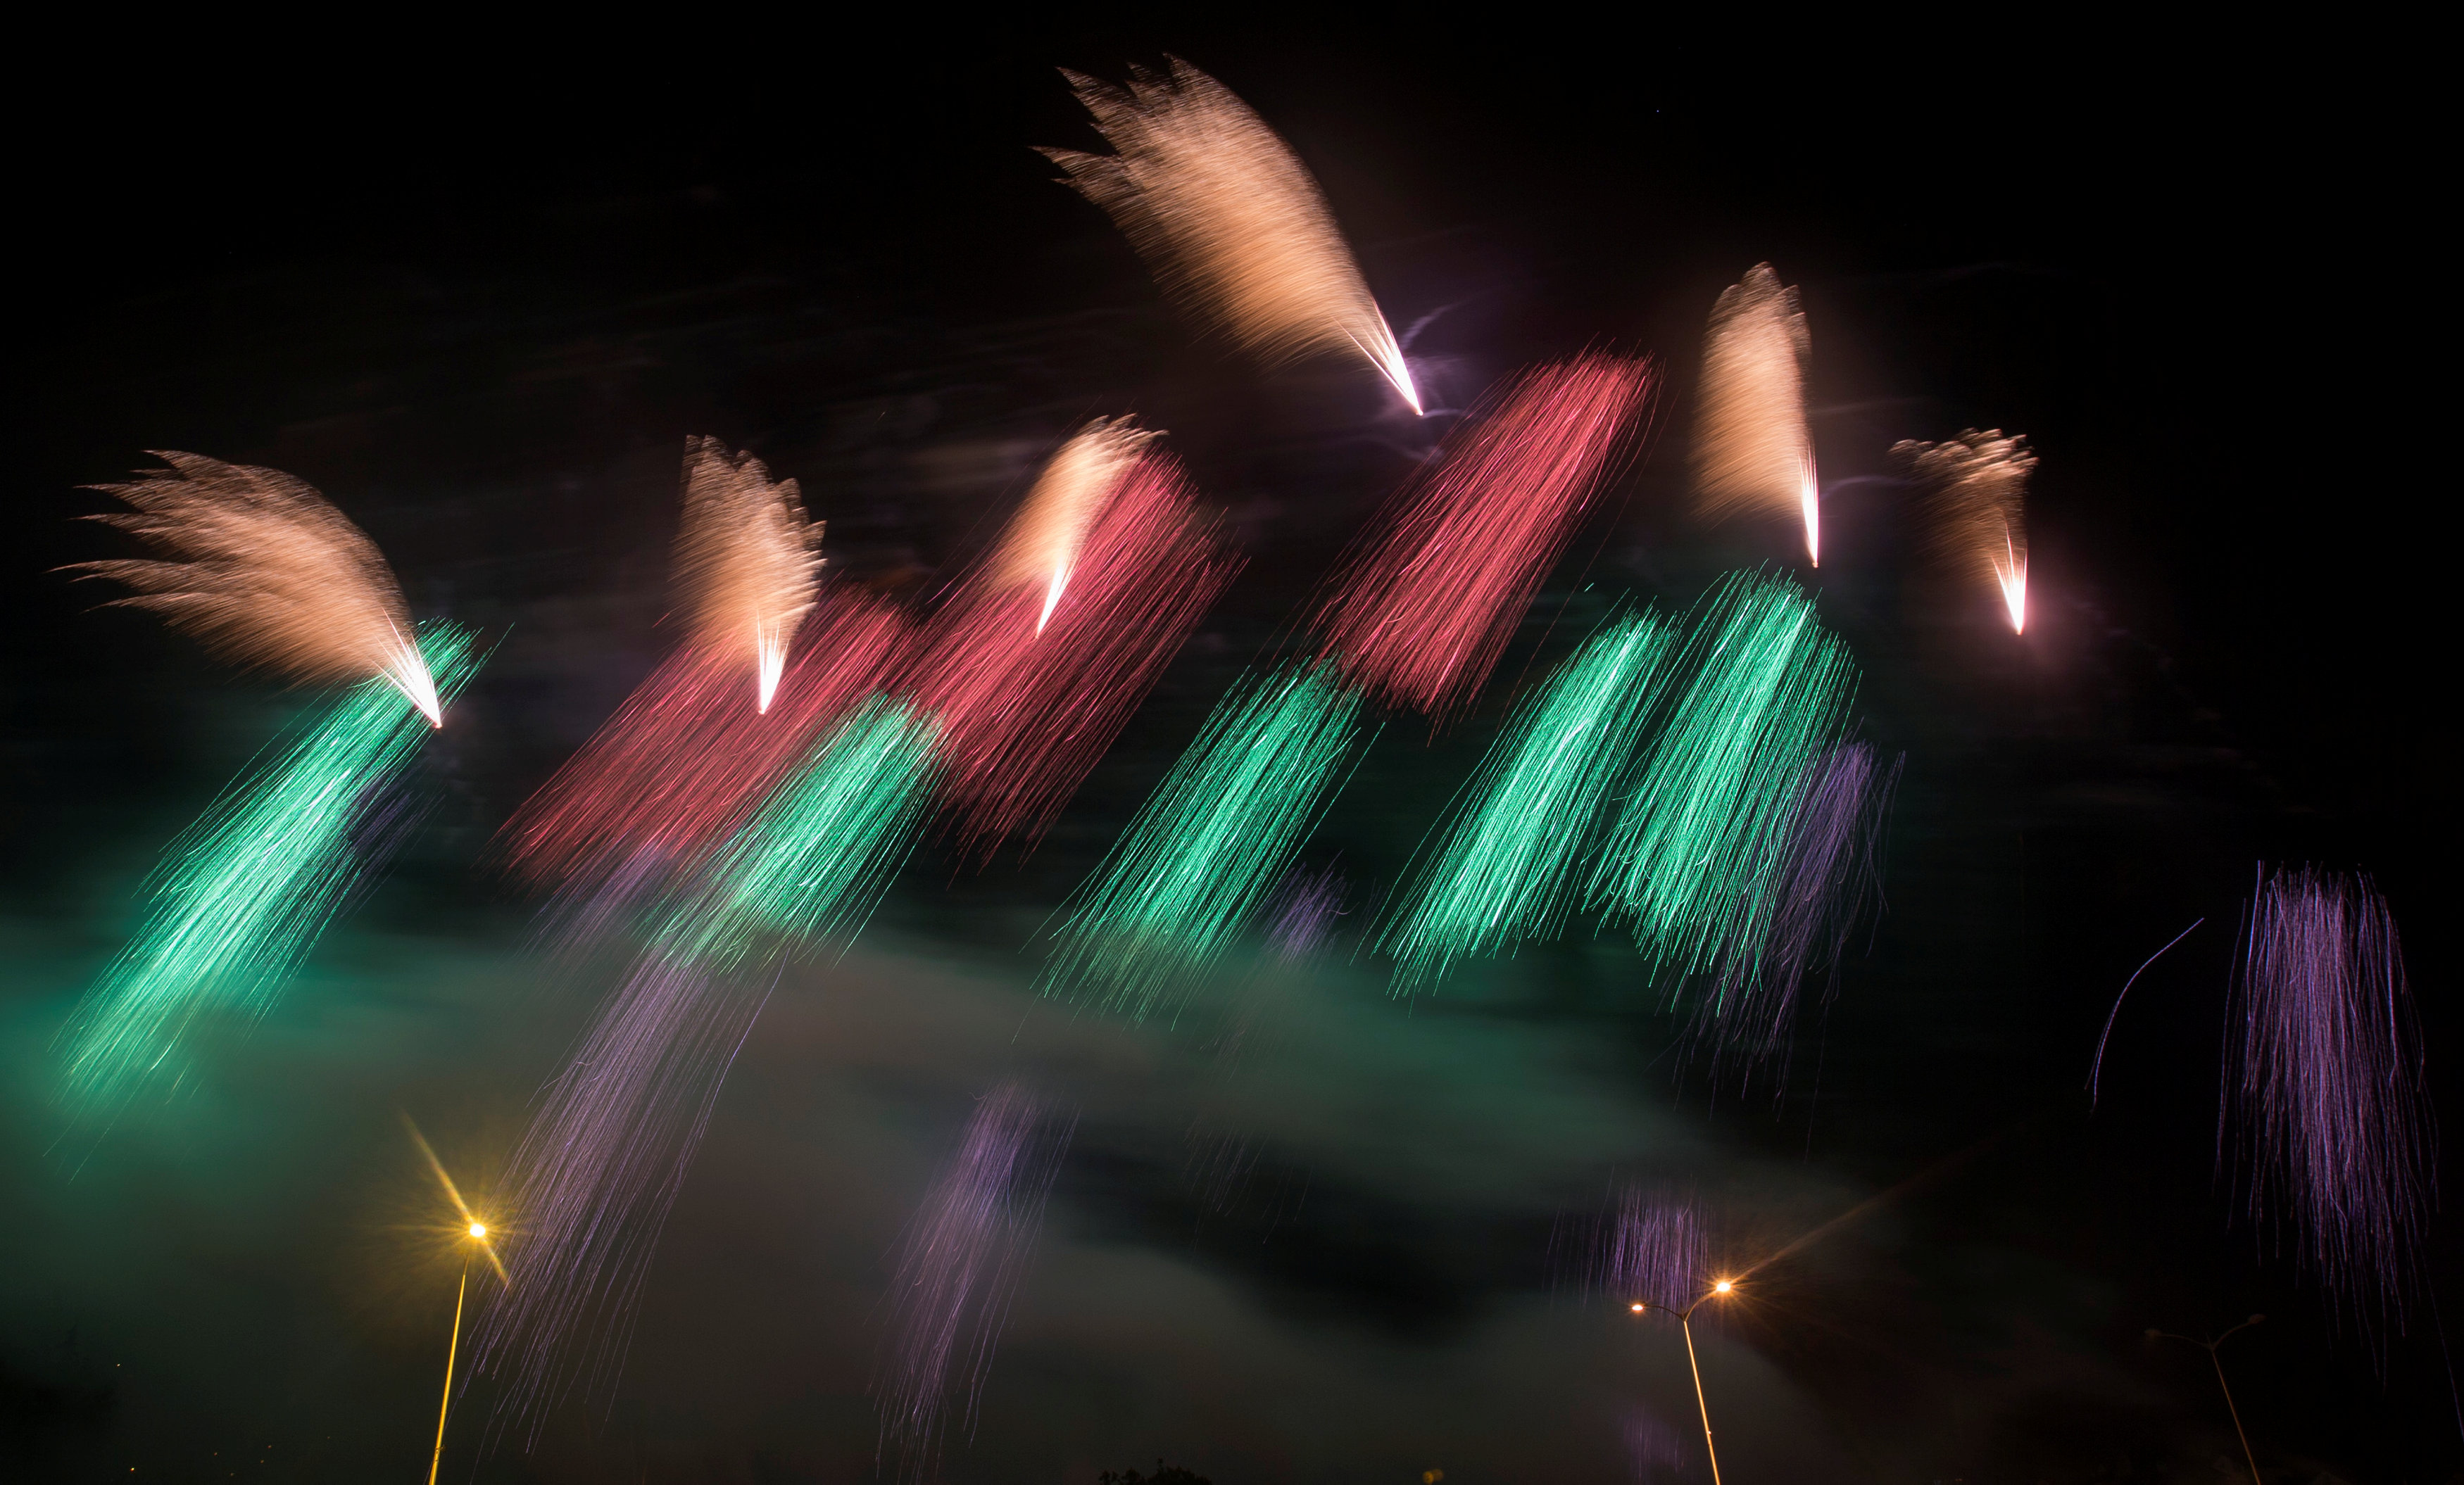 In pictures: International fireworks festival in Belarus